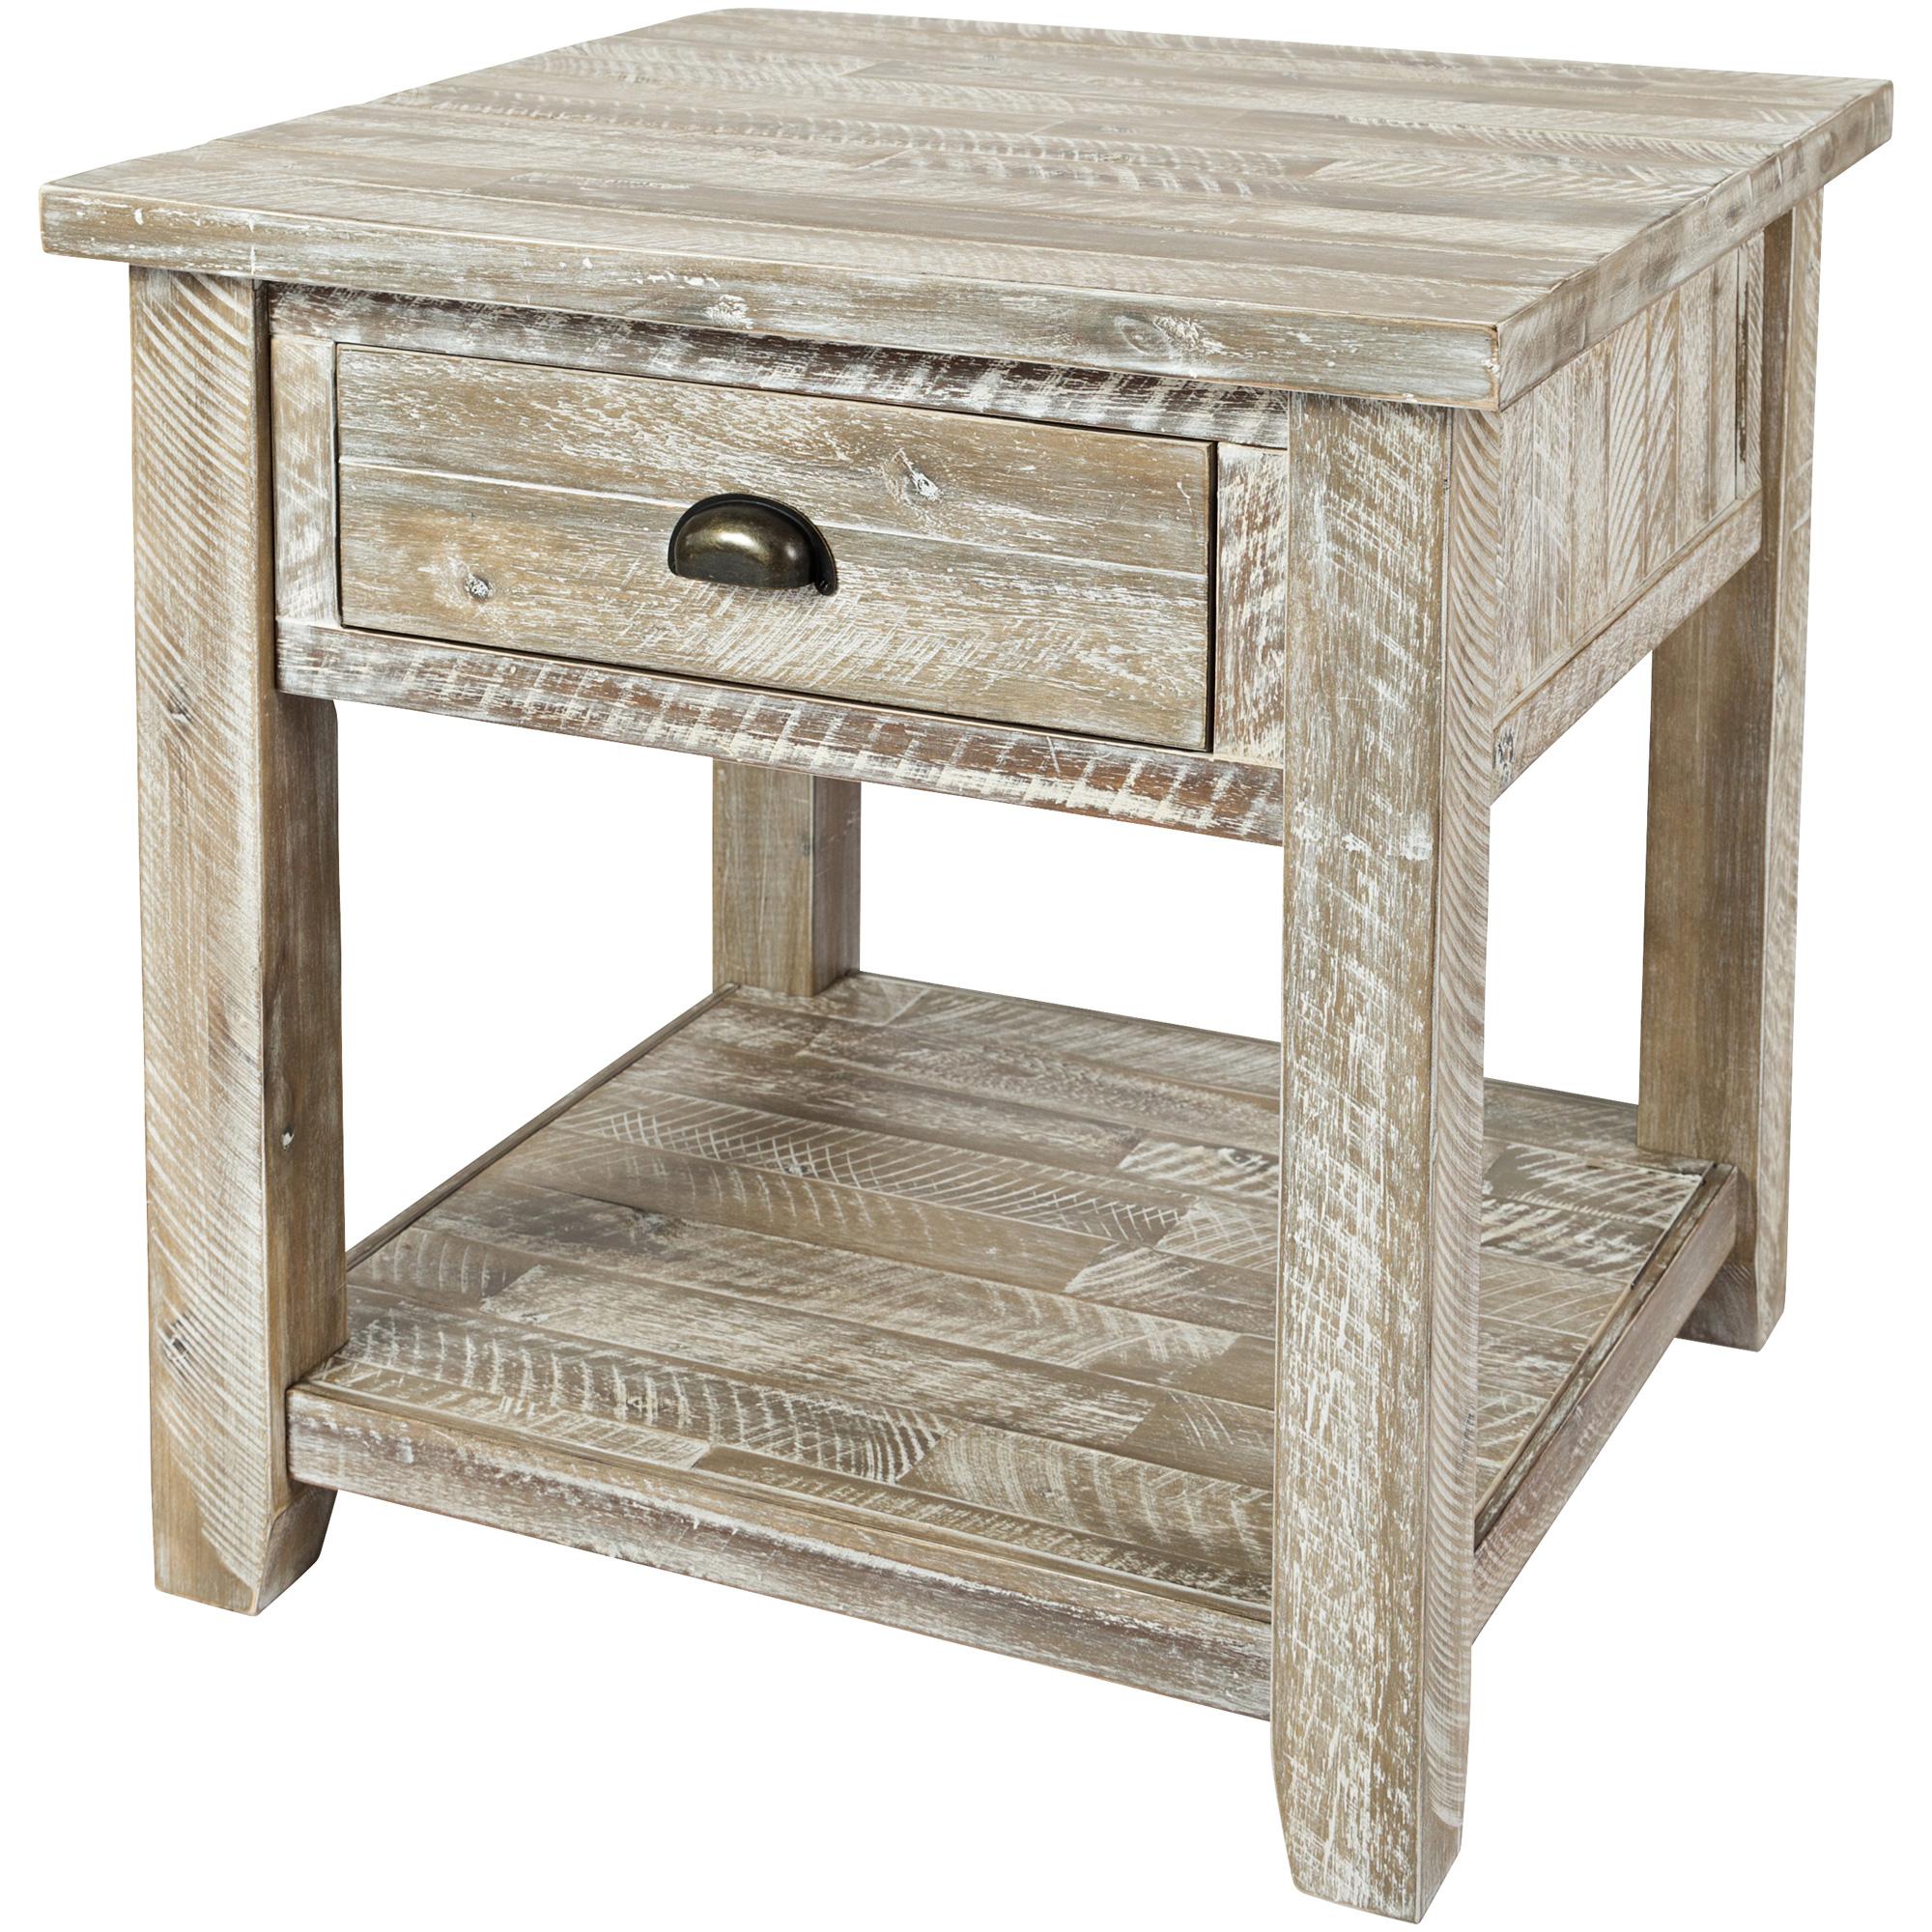 Jofran | Artisans Craft Gray Wash End Table